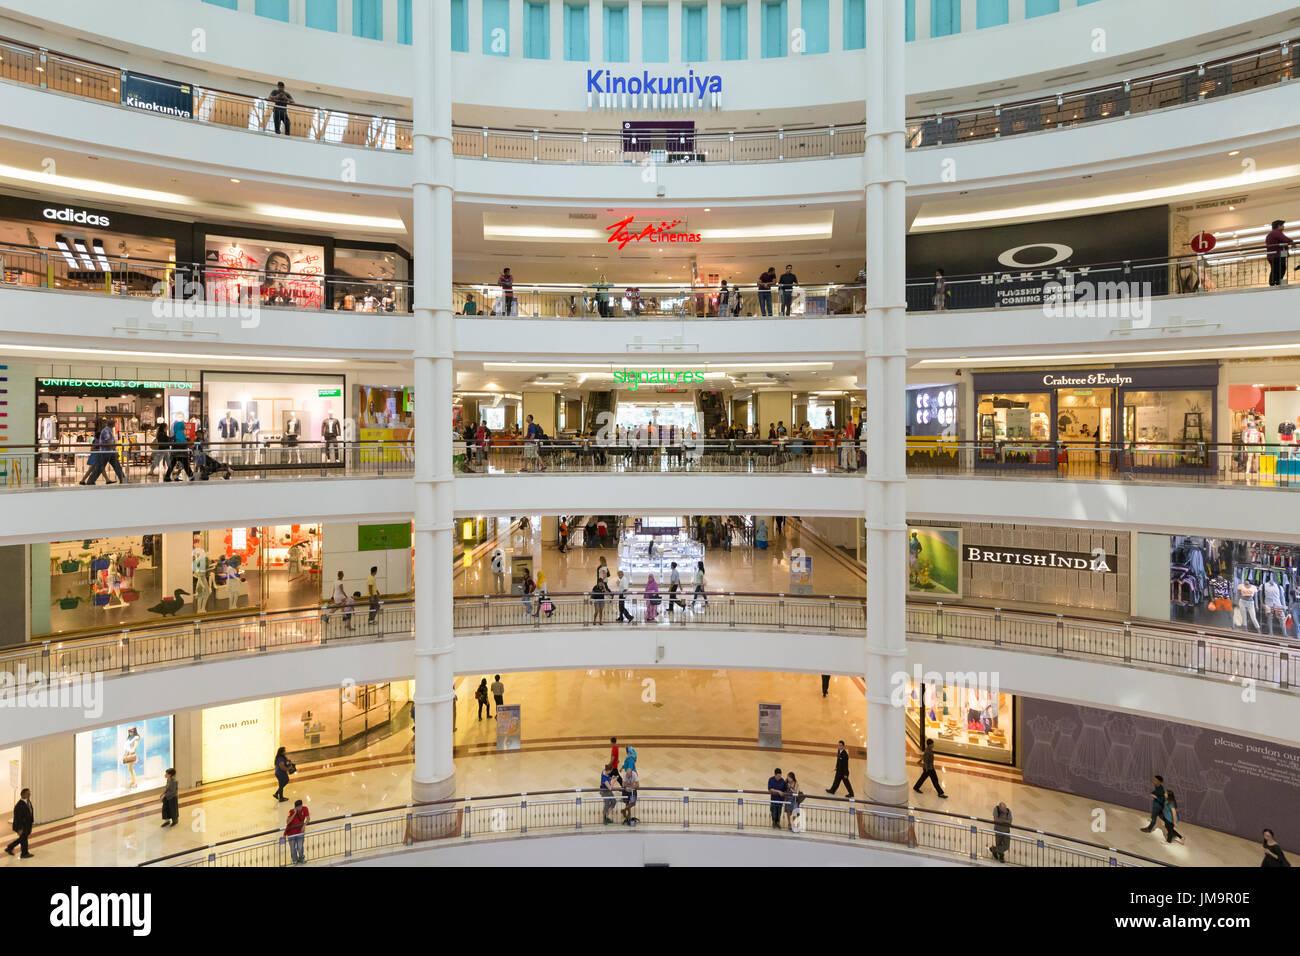 Suria KLCC Shopping Mall Interior, Kuala Lumpur, Malaysia - Stock Image